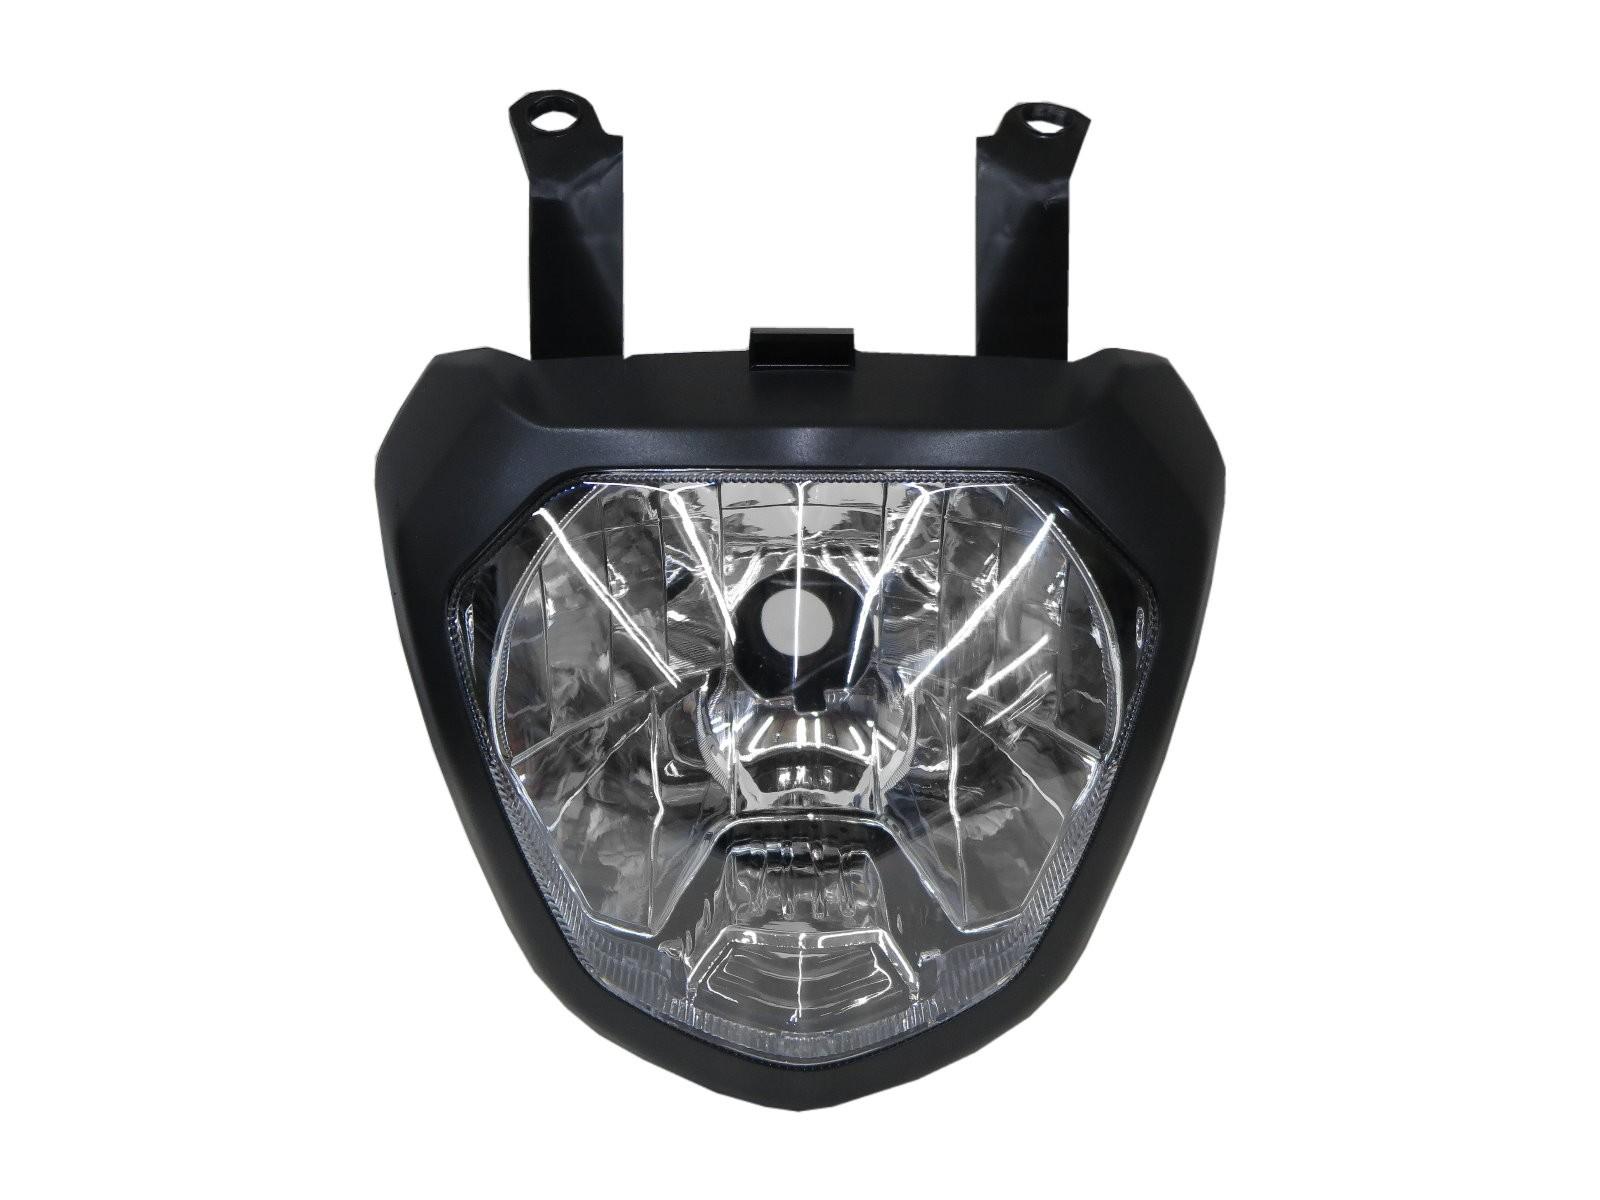 CrazyTheGod MT series MT-07 2014-2017 Motorcycles Clear Headlight Headlamp Chrome for YAMAHA